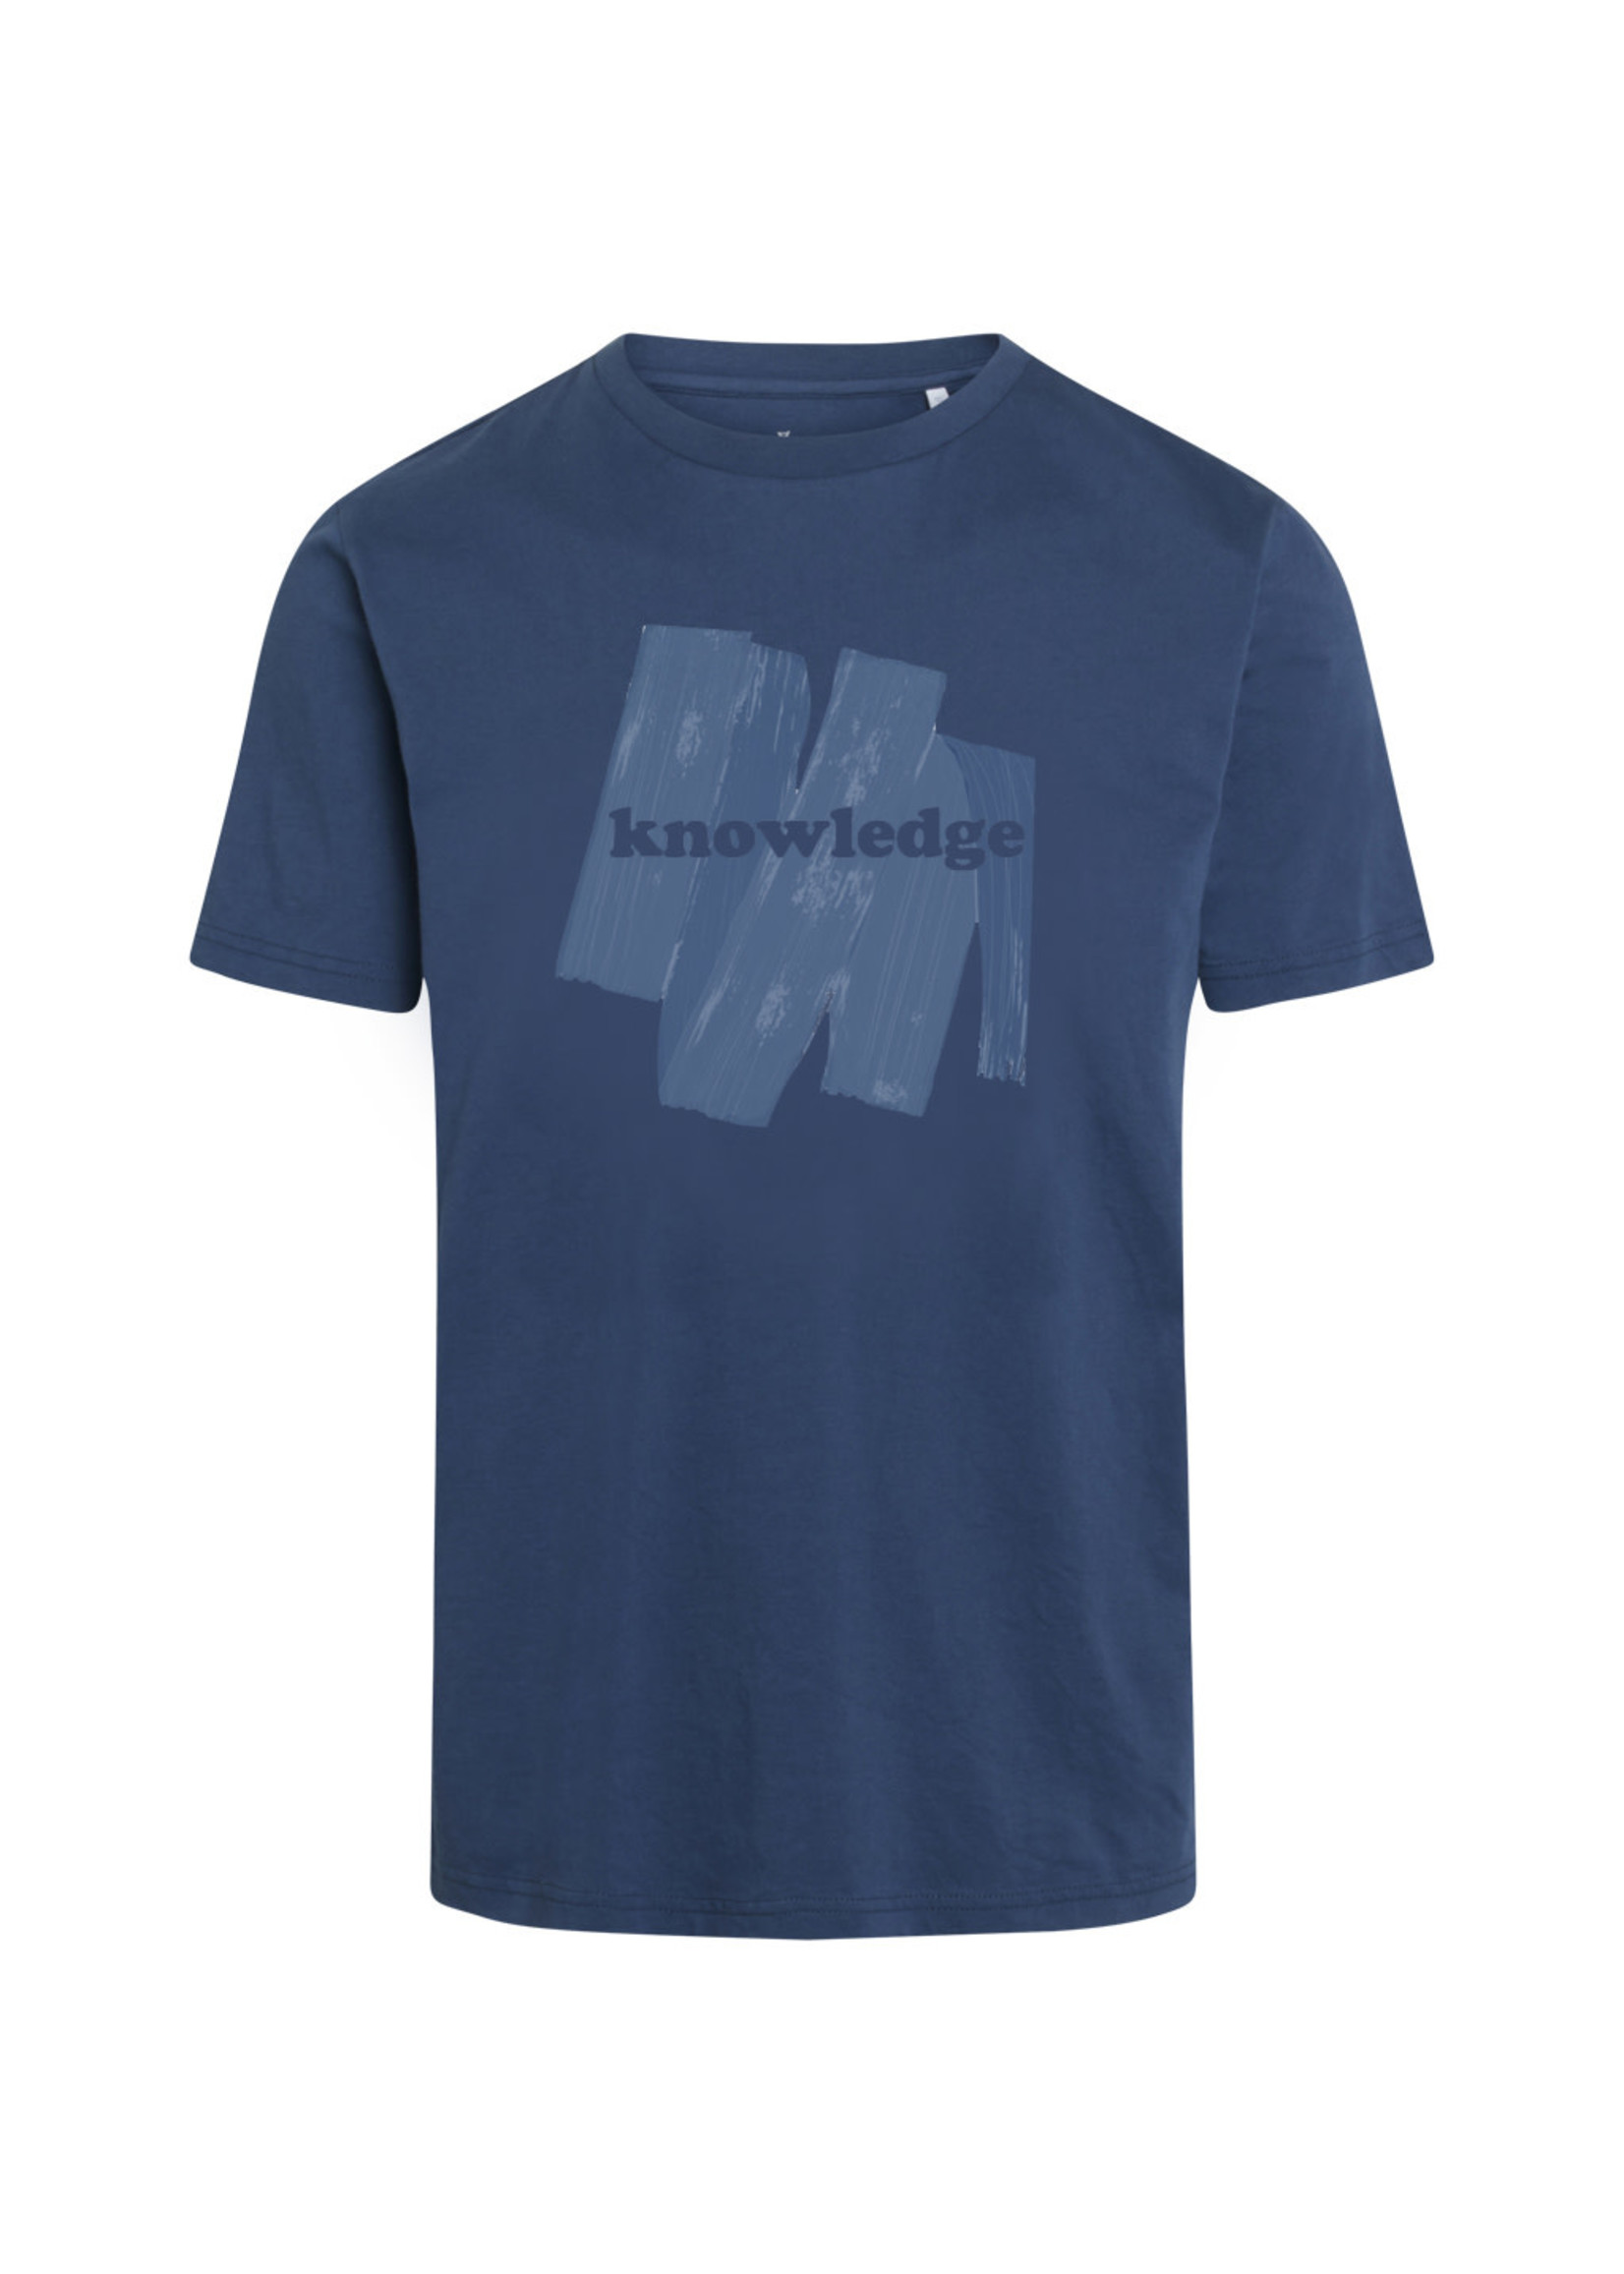 KnowledgeCotton KnowledgeCotton Alder Brushed Knowledge T-shirt